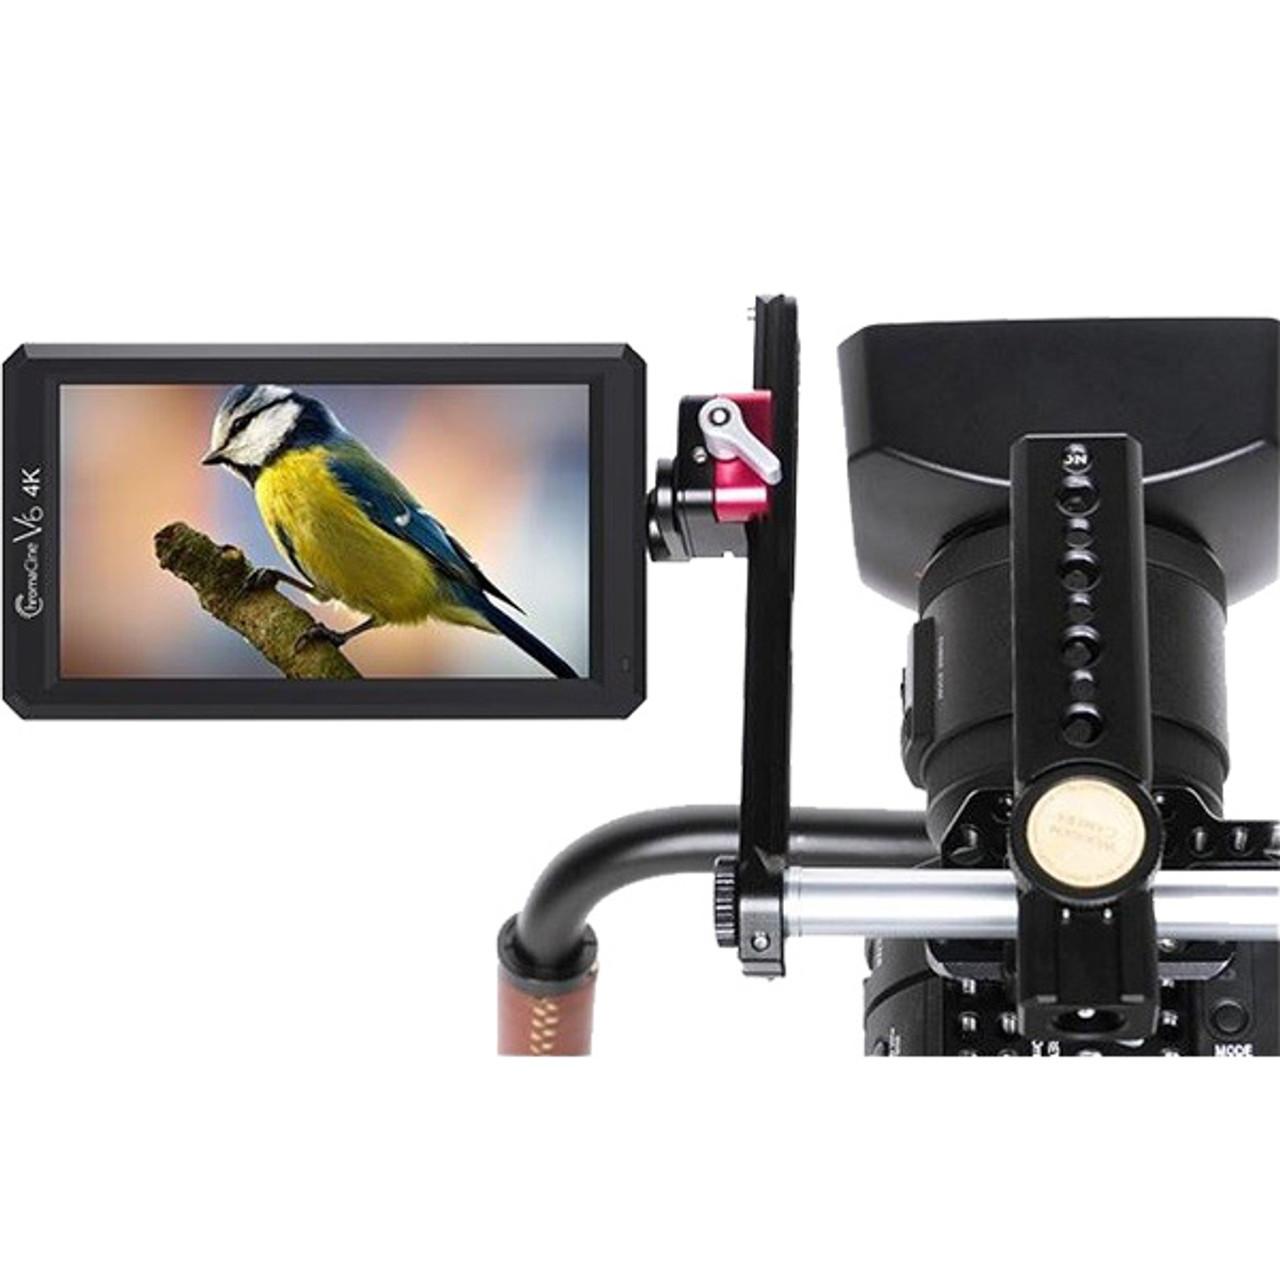 ChromaCine V6 5.7-inch 4K HDMI On-Camera Field Monitor